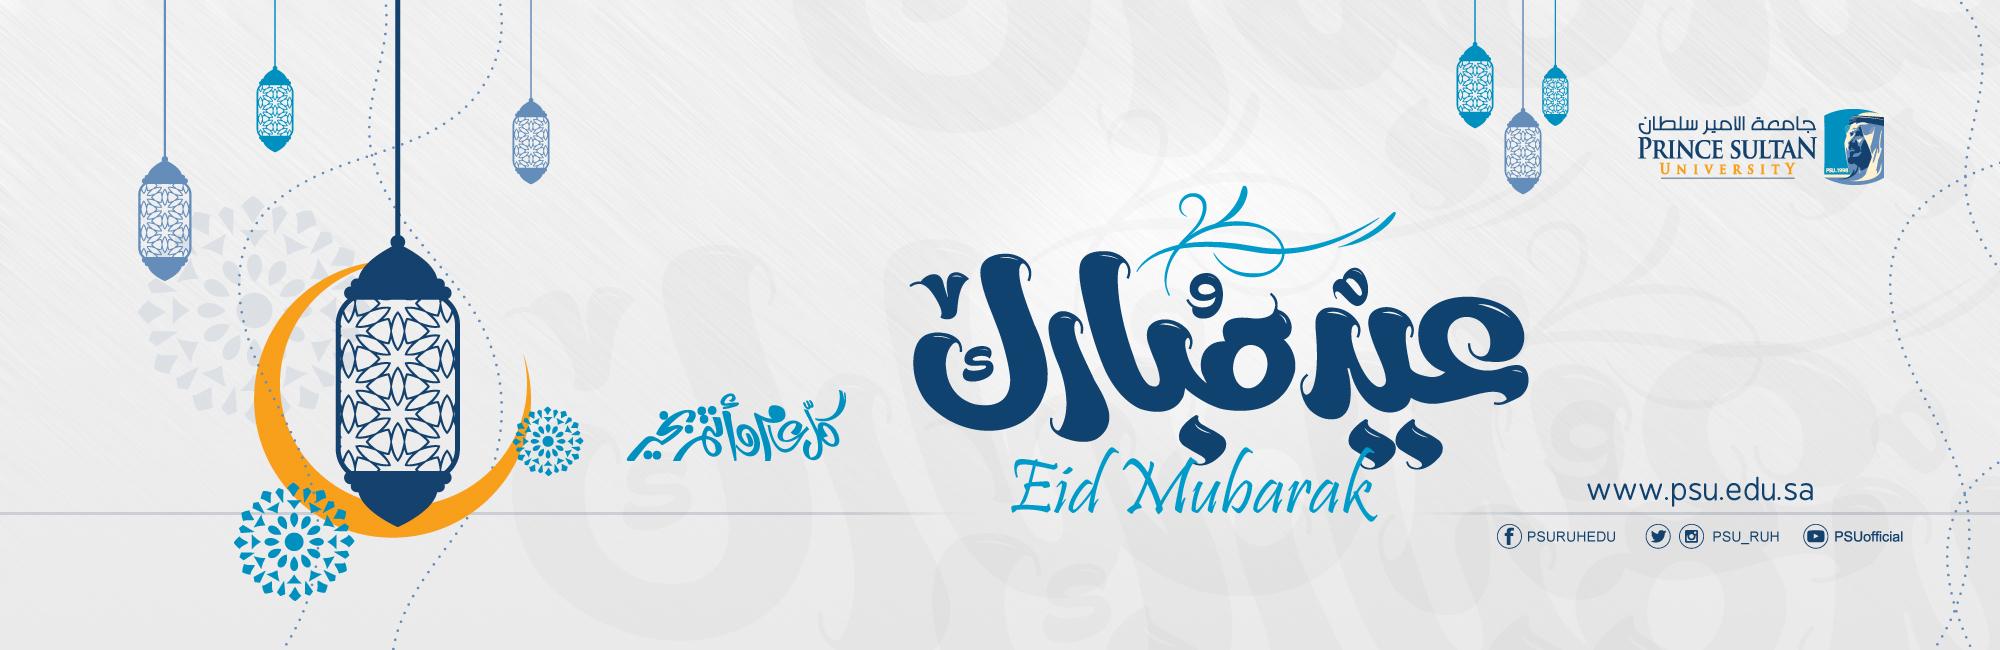 Eid Mubarak Greetings from Prince Sultan University